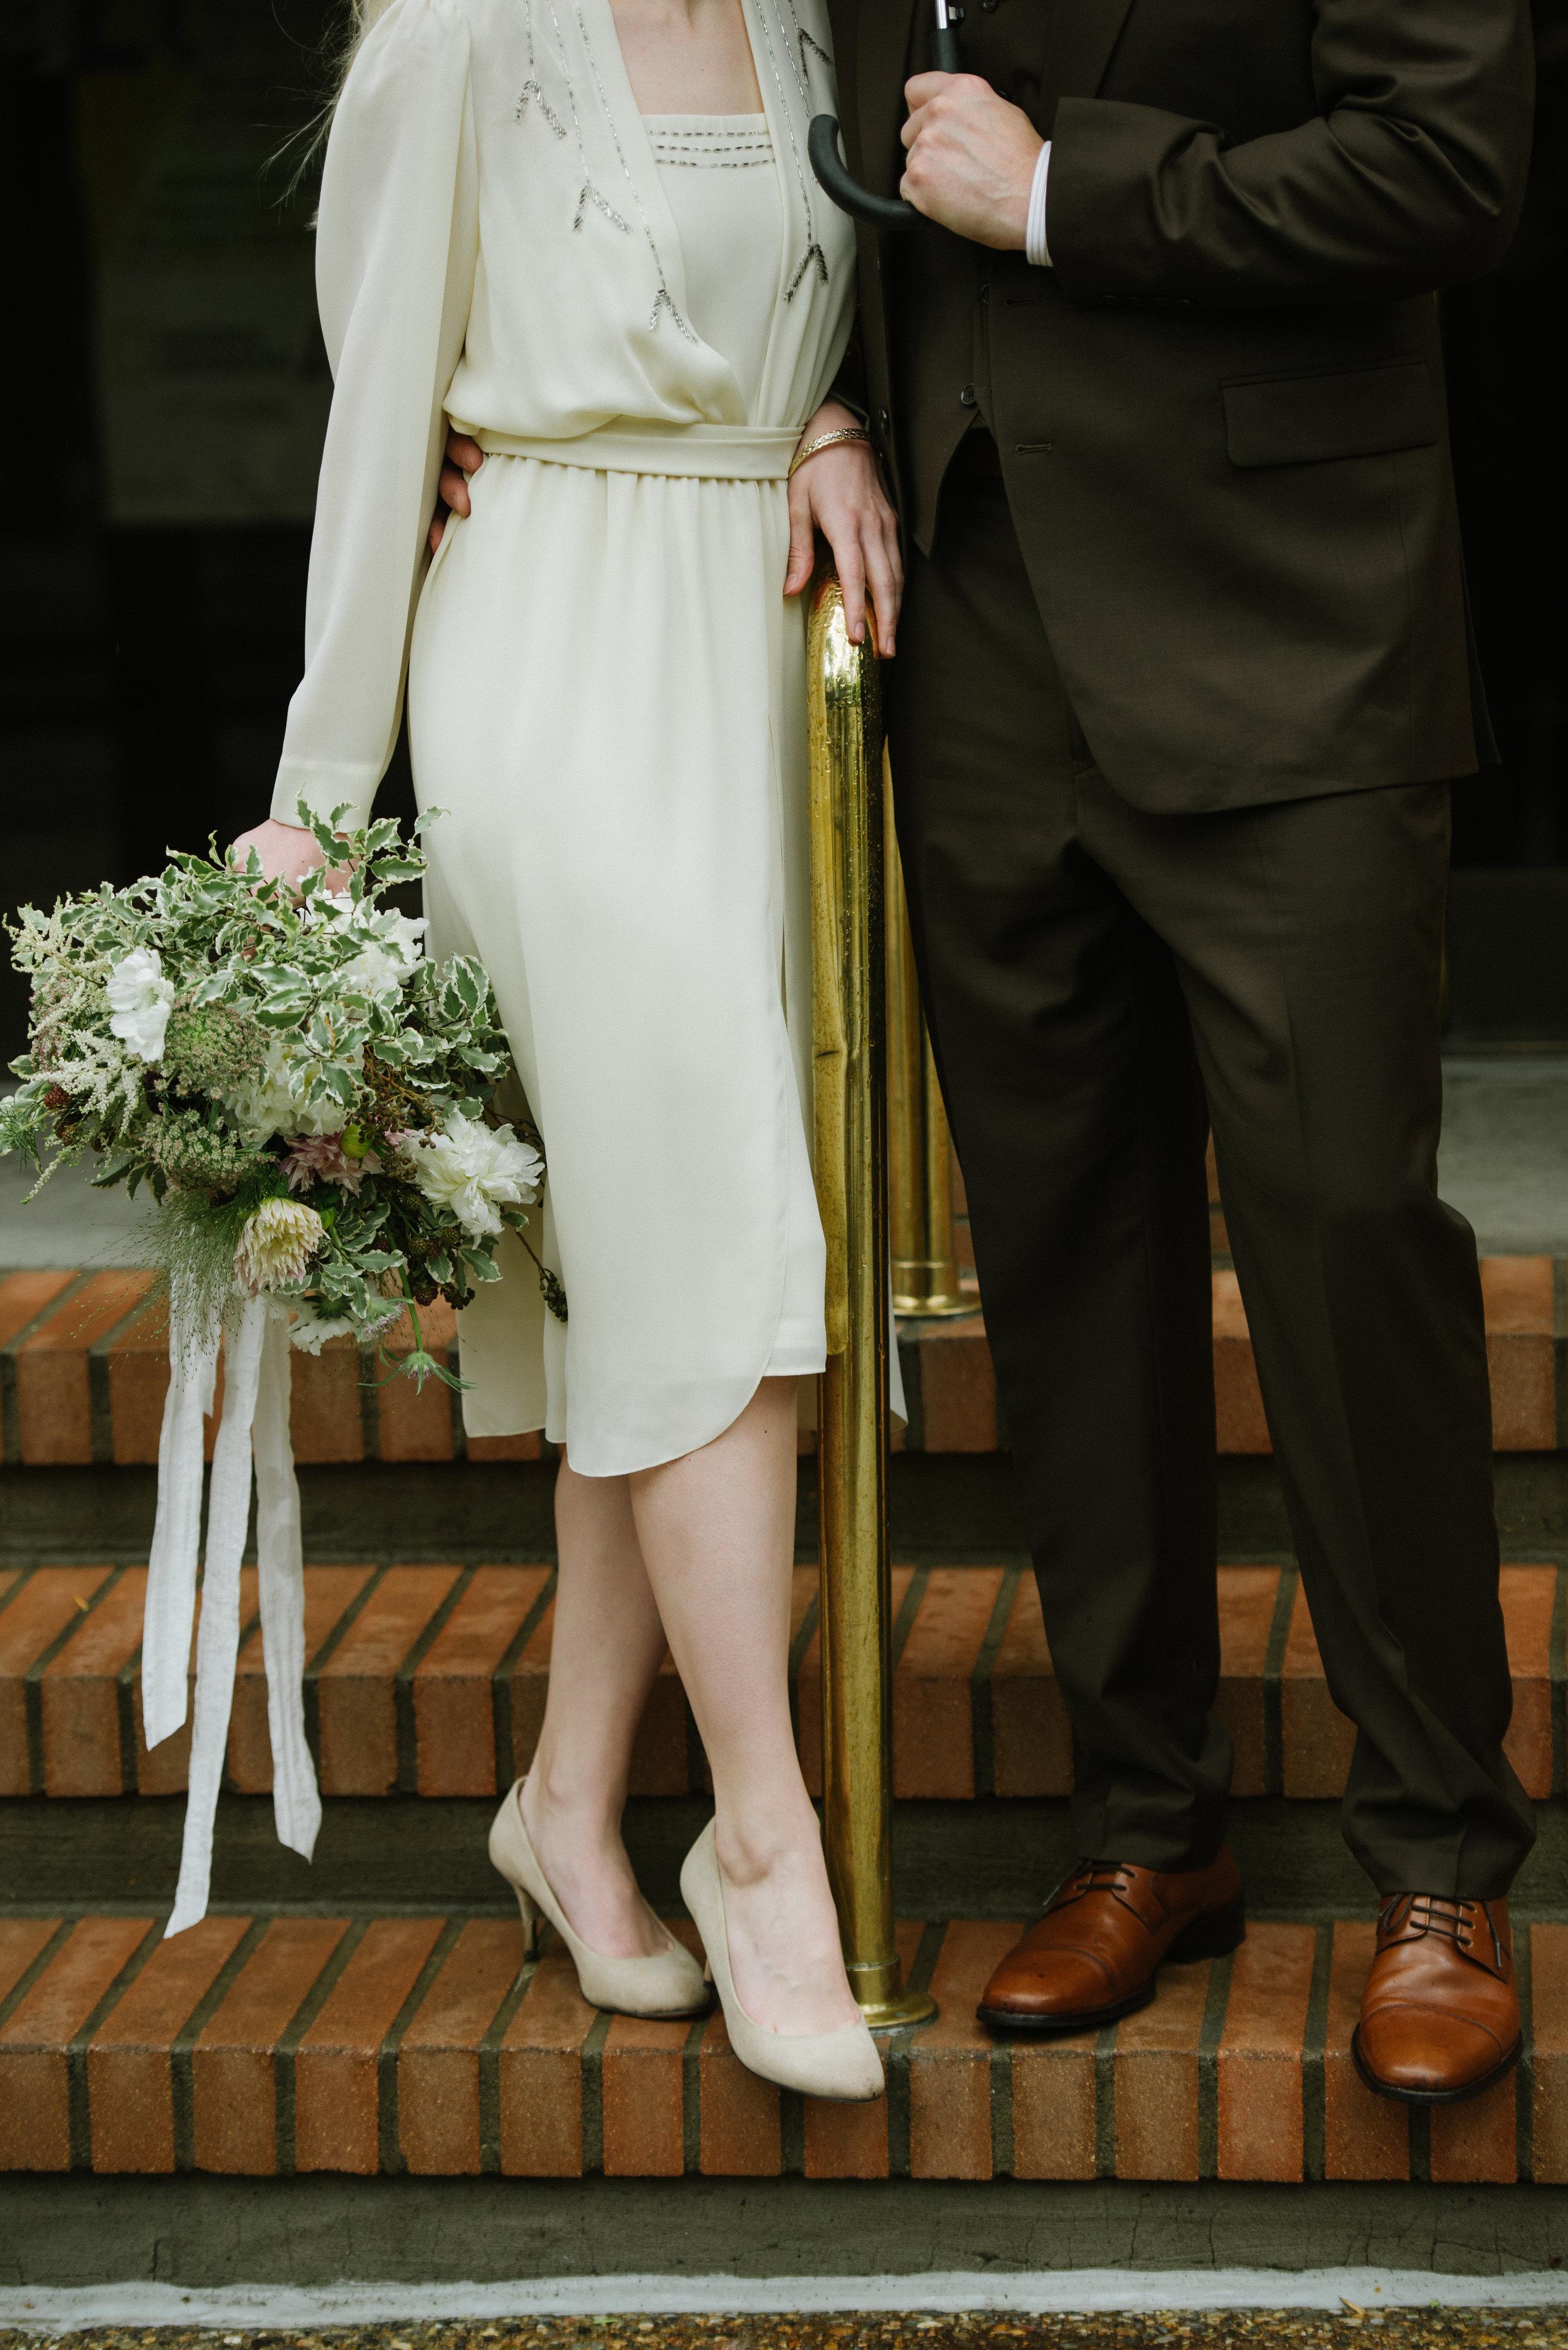 Teatro_Wedding_Calgary_Wedding_Photography_Vanessa_Tom_Married_2018_HR010.jpg